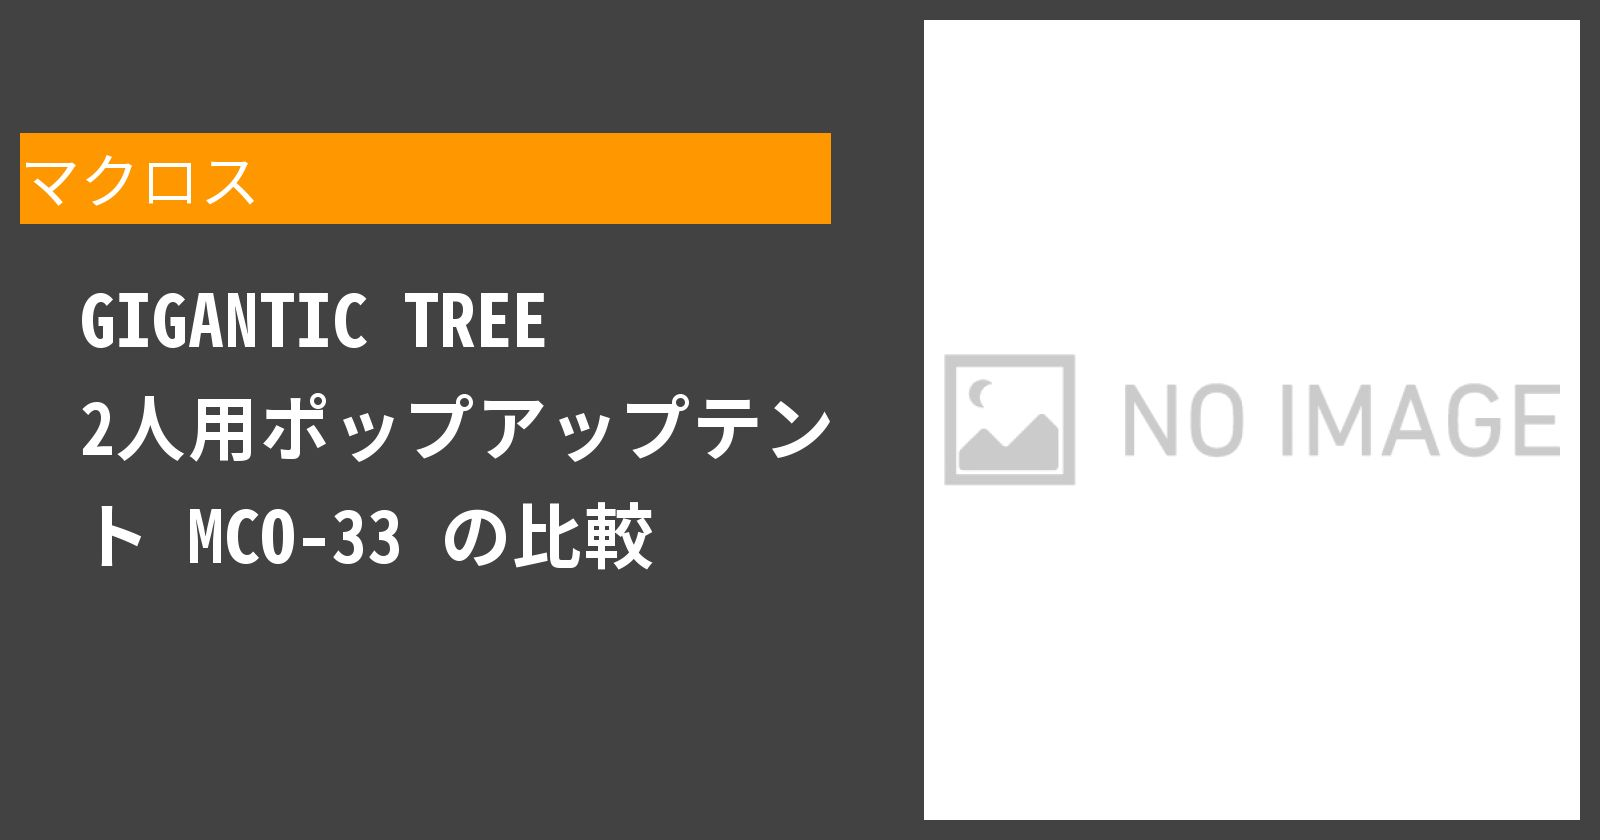 GIGANTIC TREE 2人用ポップアップテント MCO-33を徹底評価